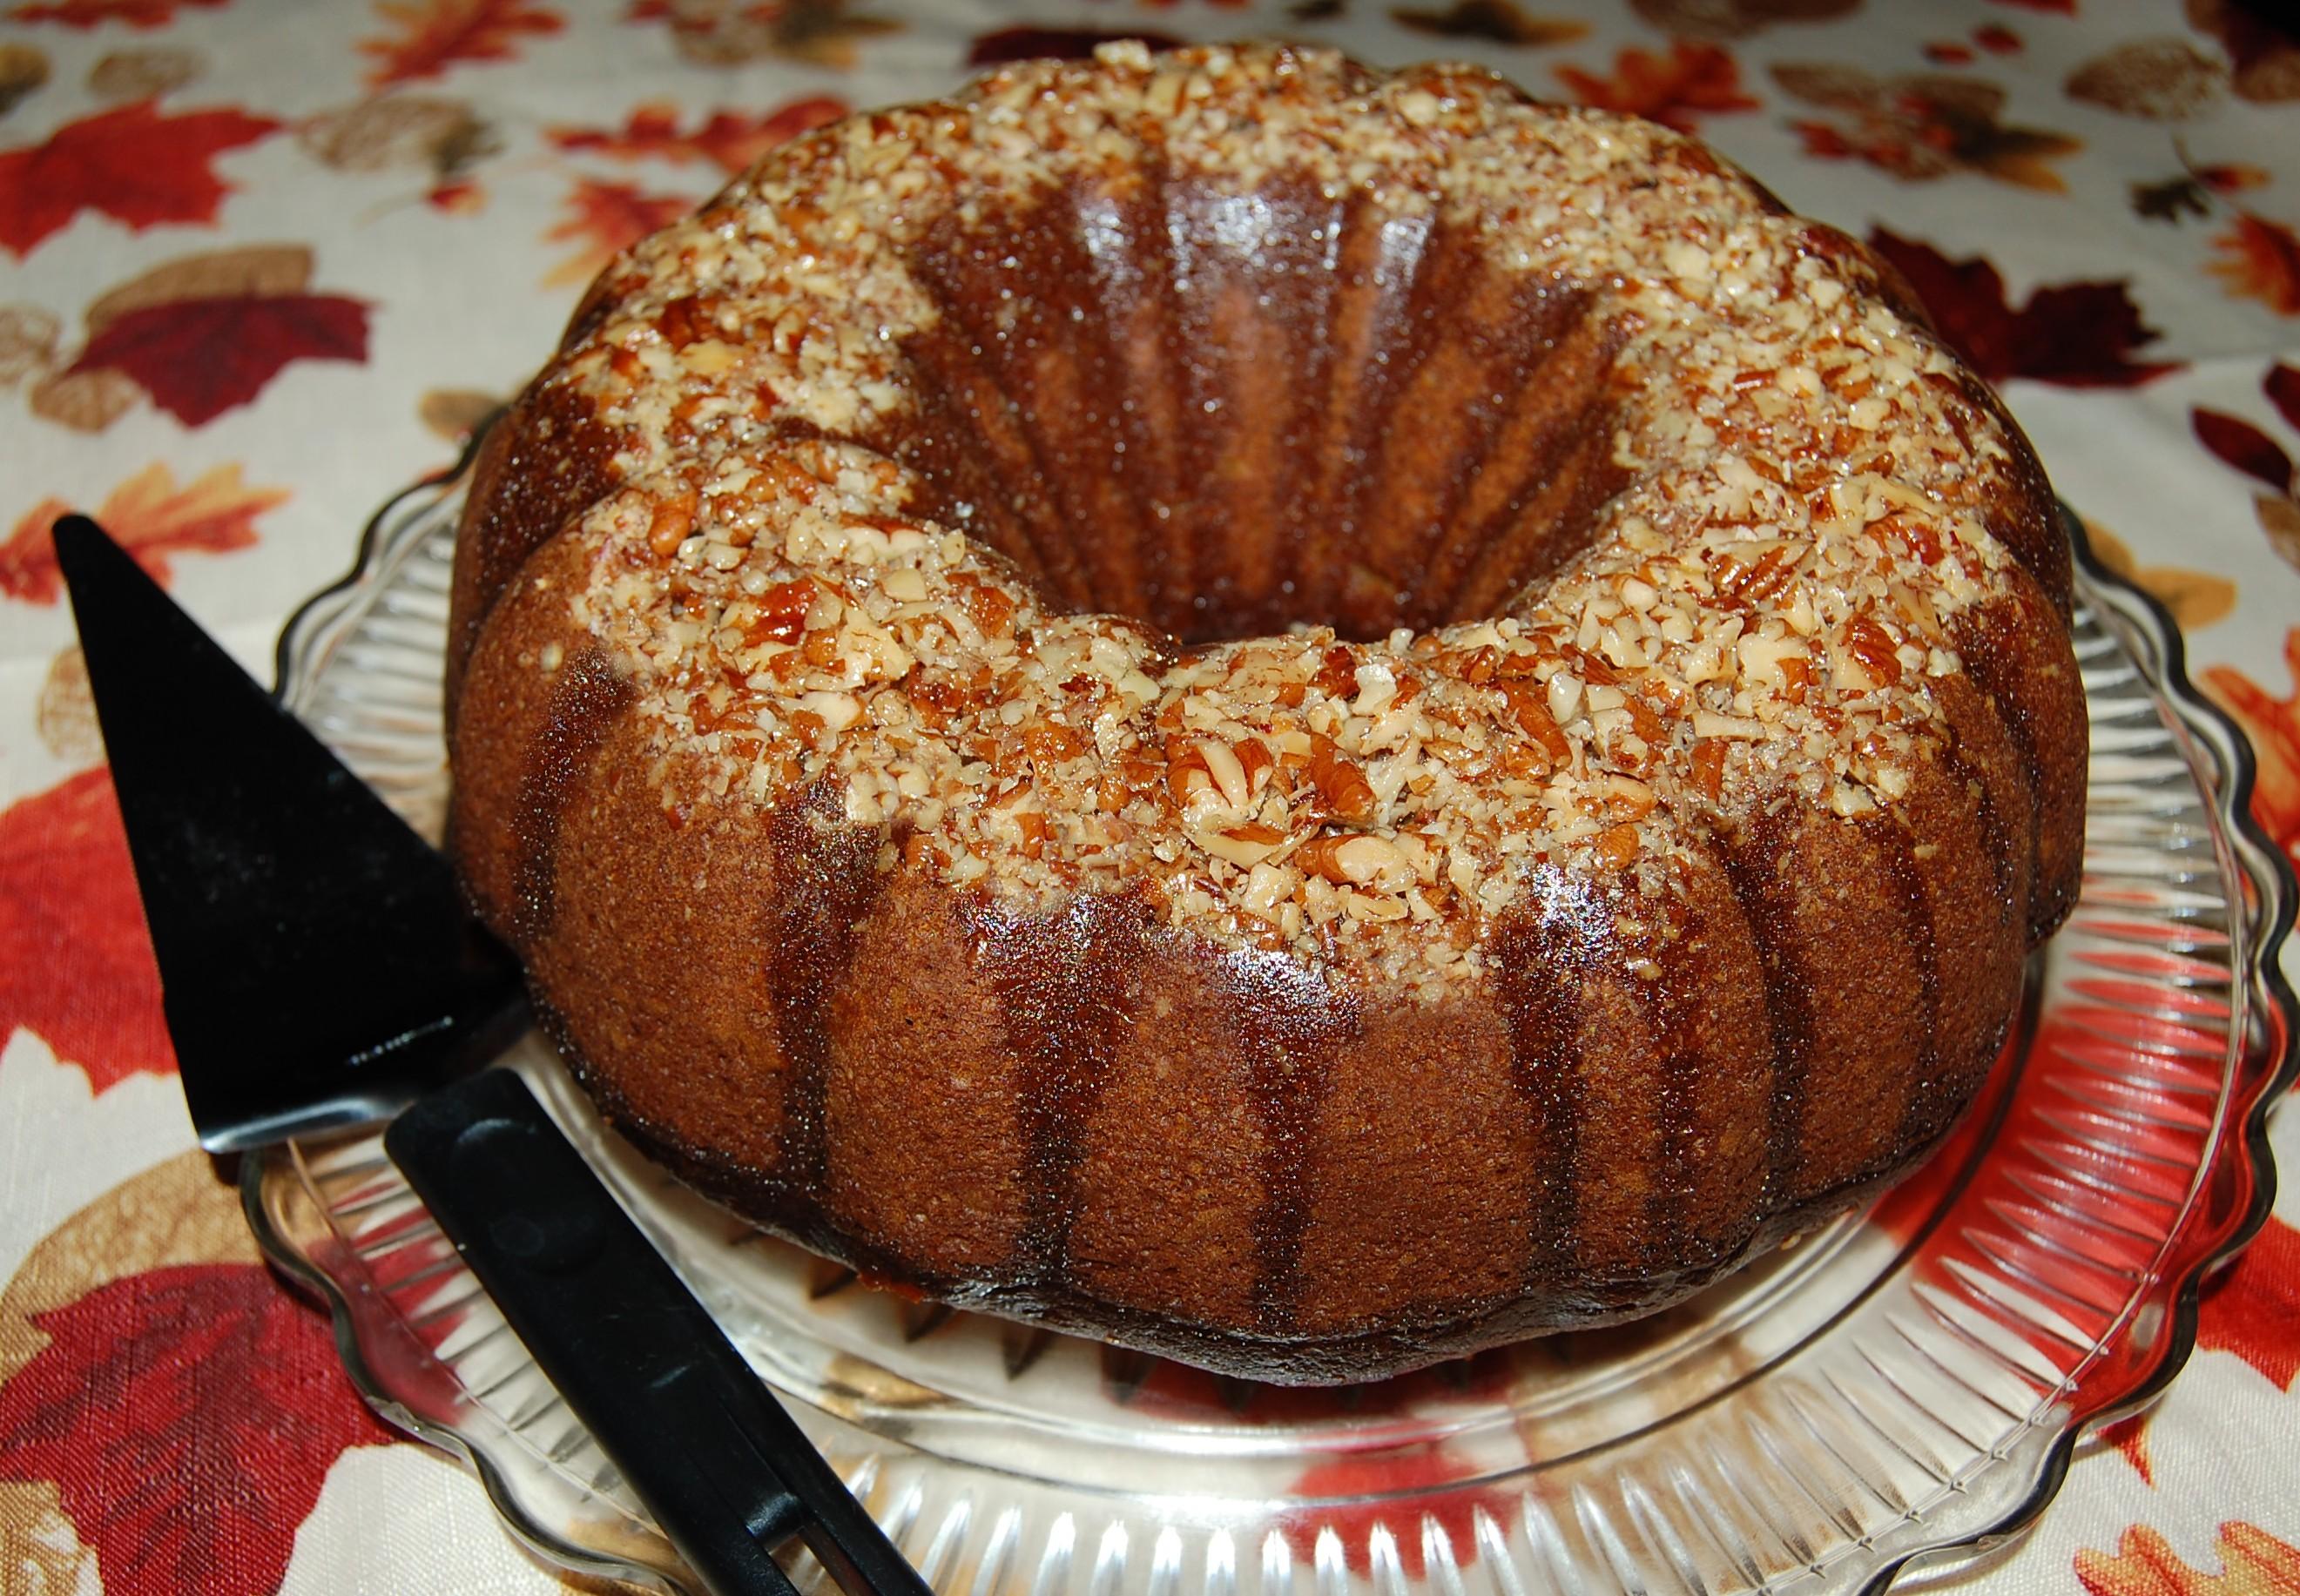 Mama S Cake Recipe Italian: Pumpkin Pecan Rum Cake